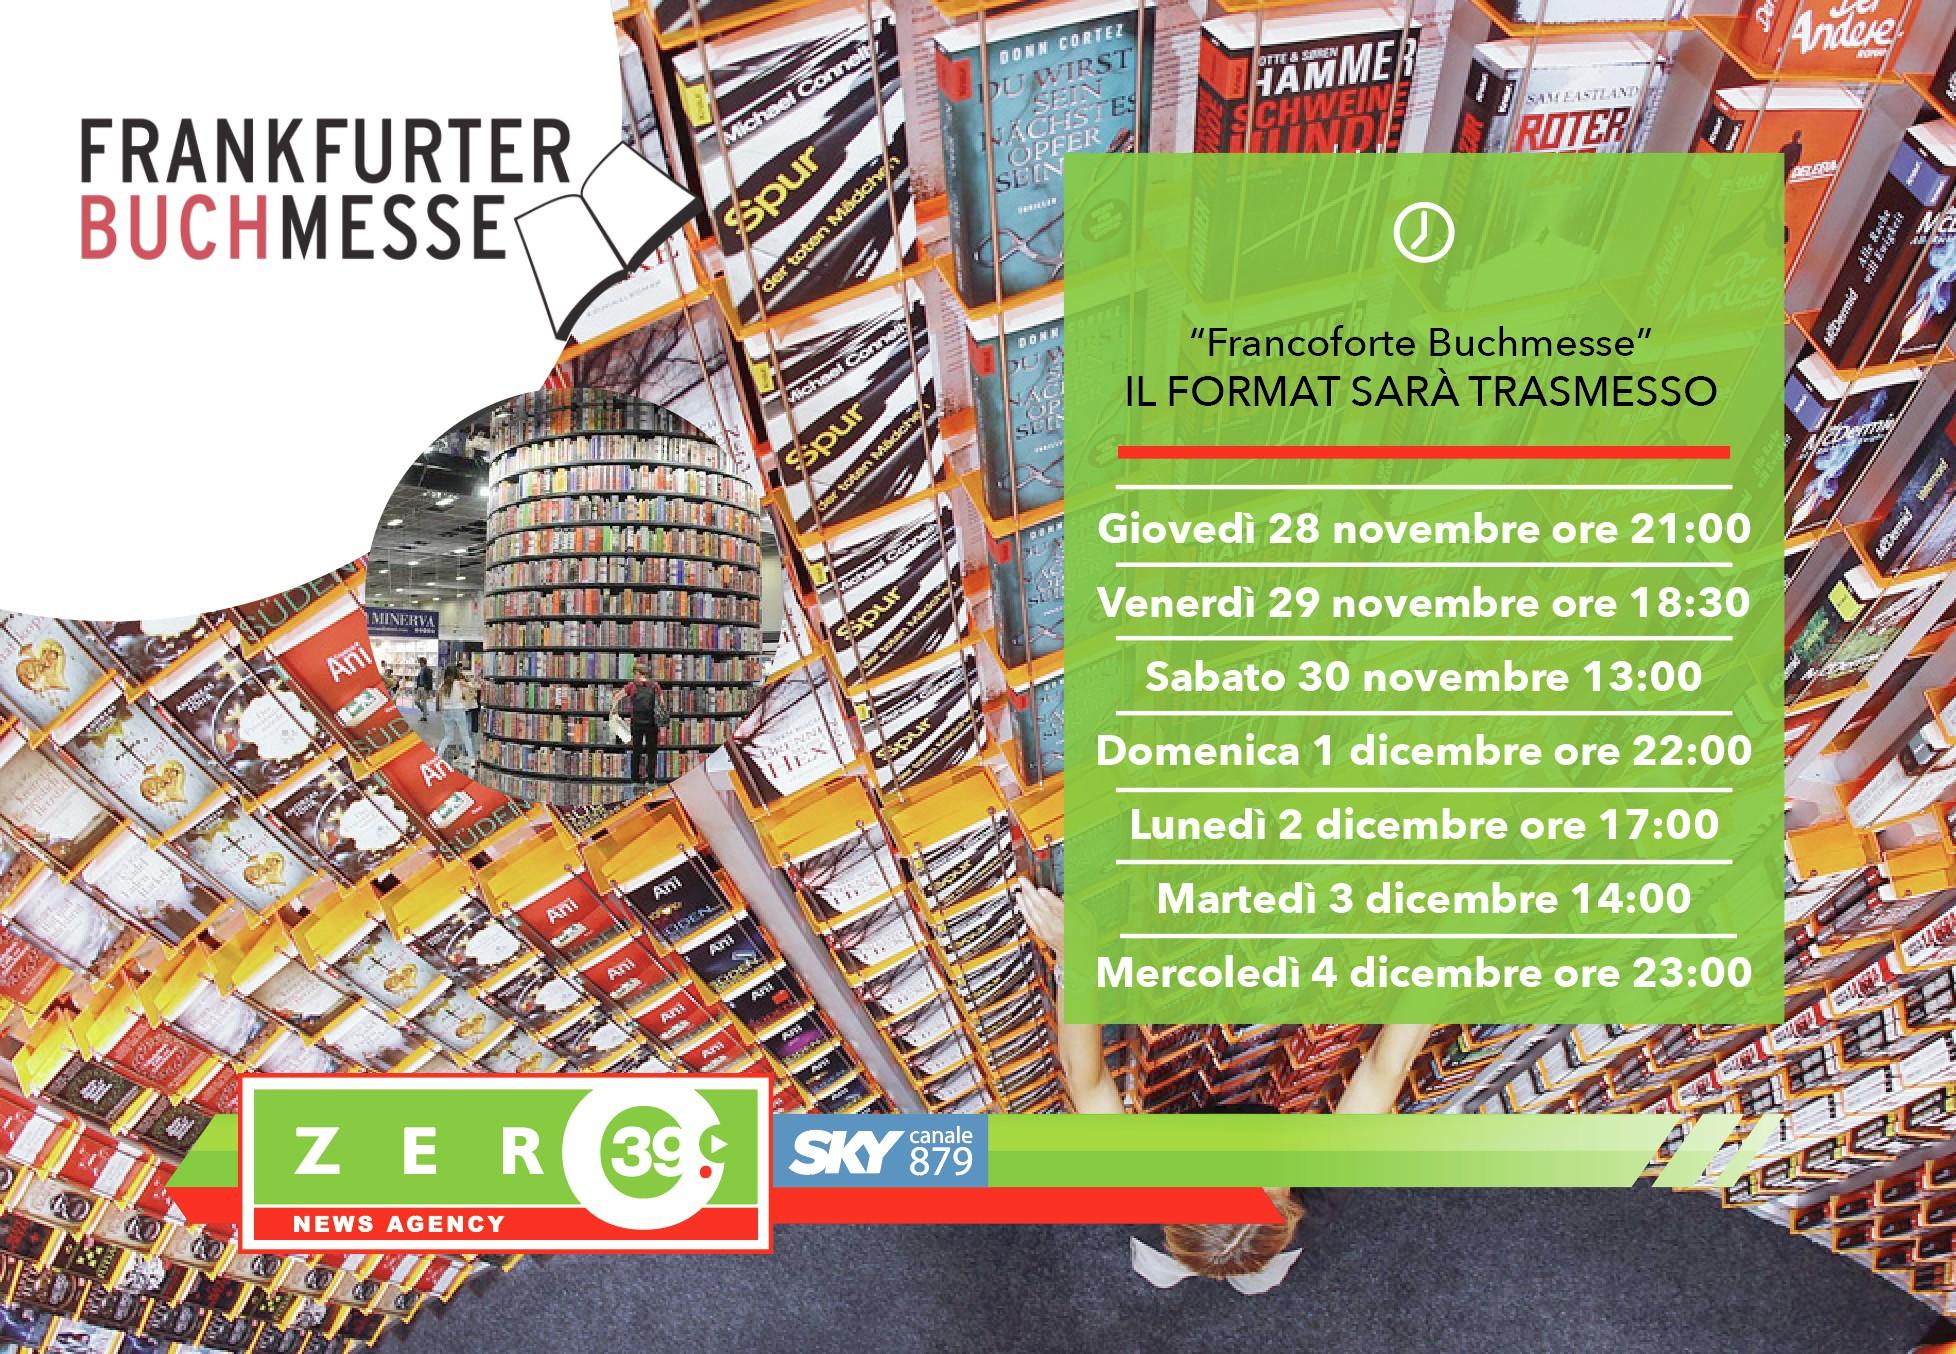 francoforte buchmesse 2019